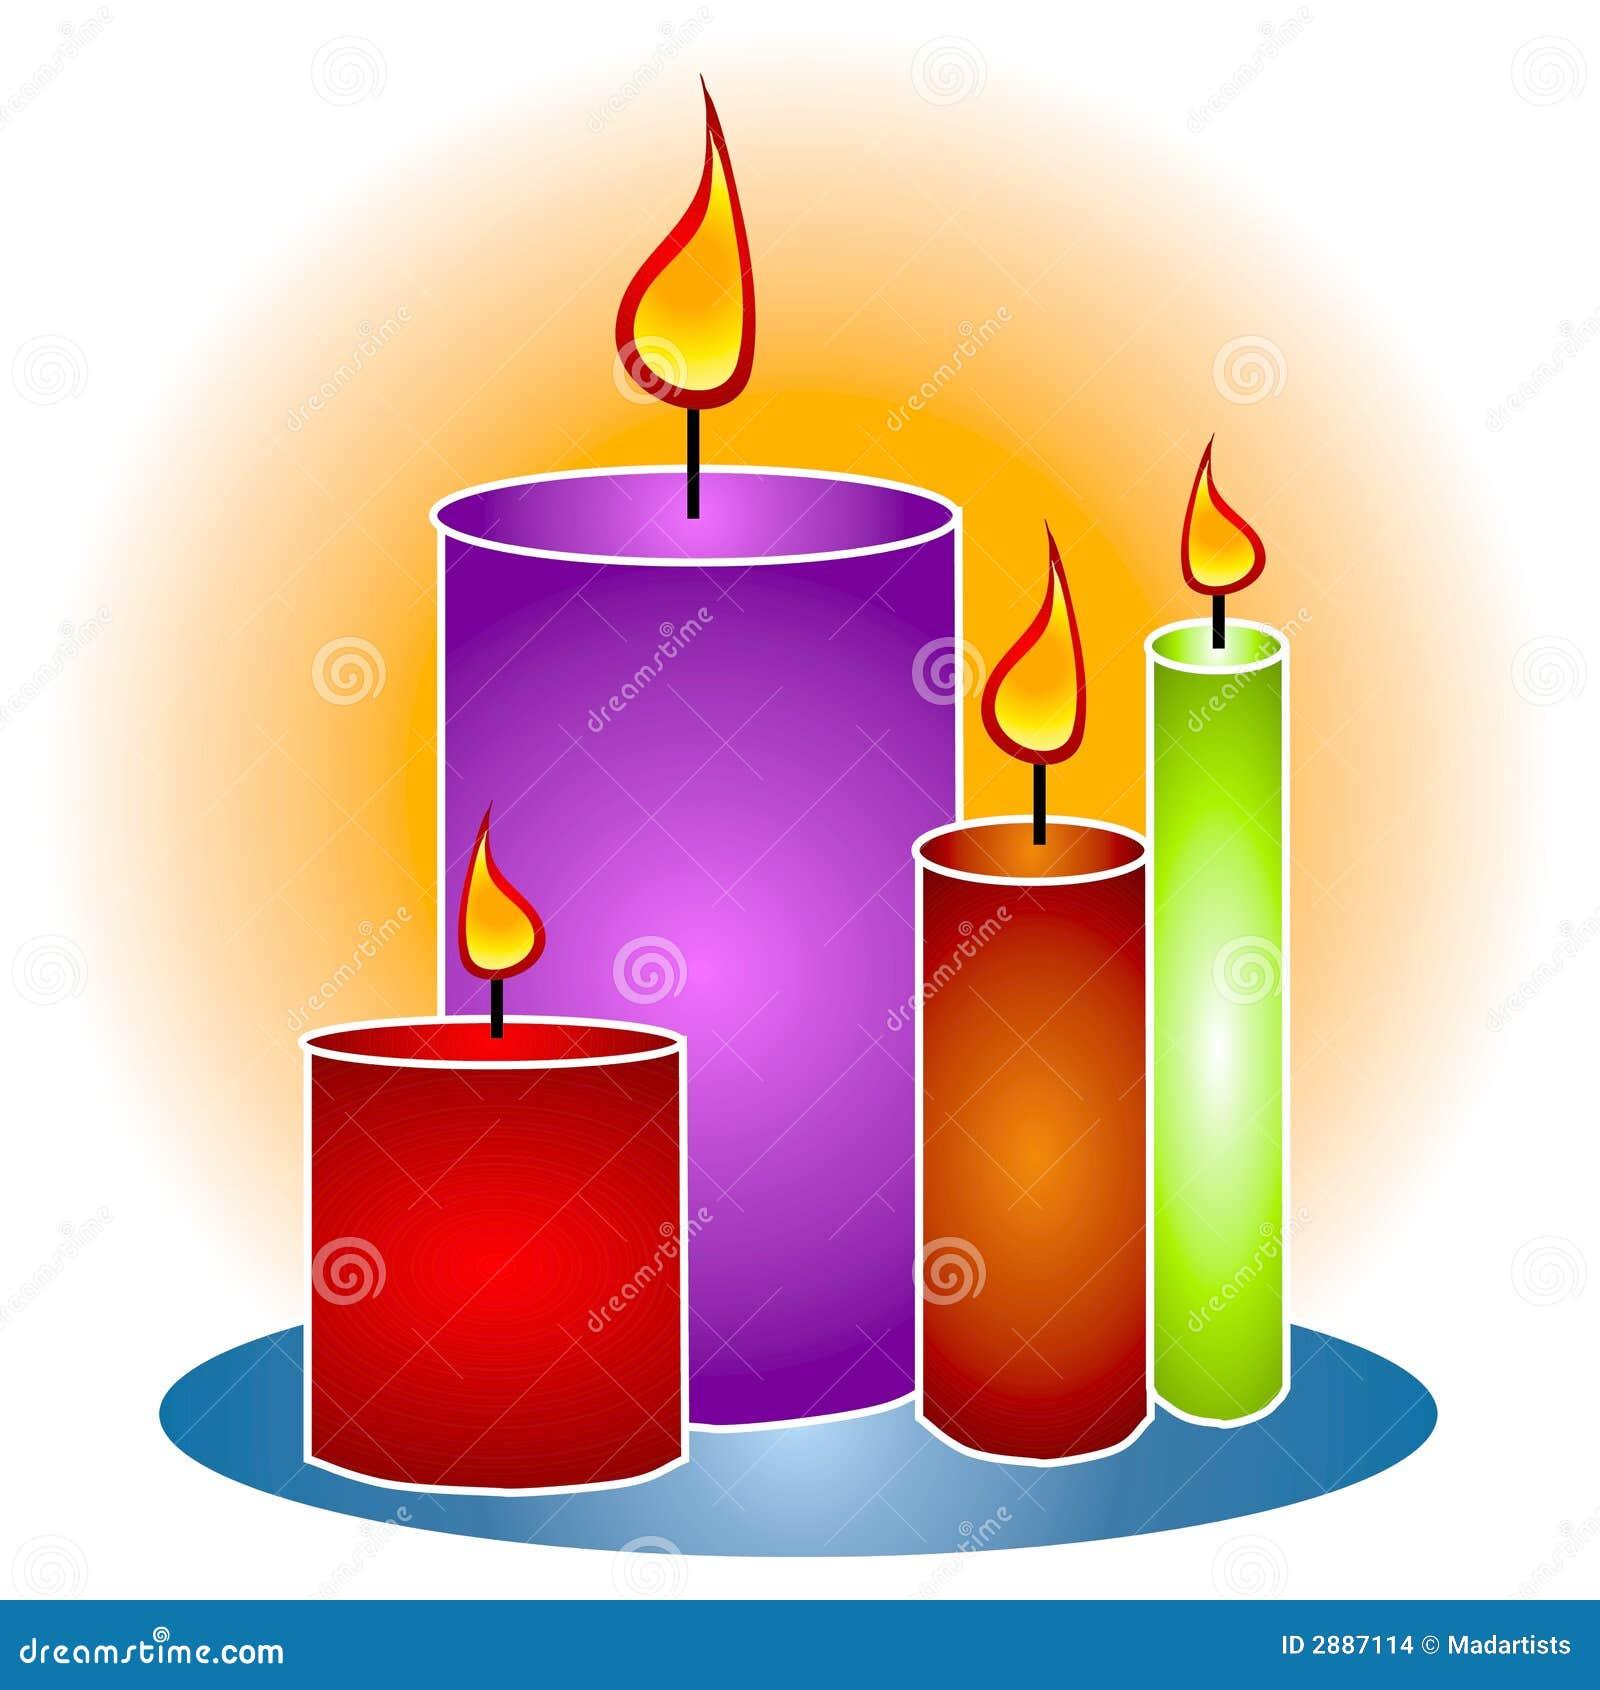 lit decorative candles clipart stock illustration illustration of rh dreamstime com clipart candlestick base clip art candle scents